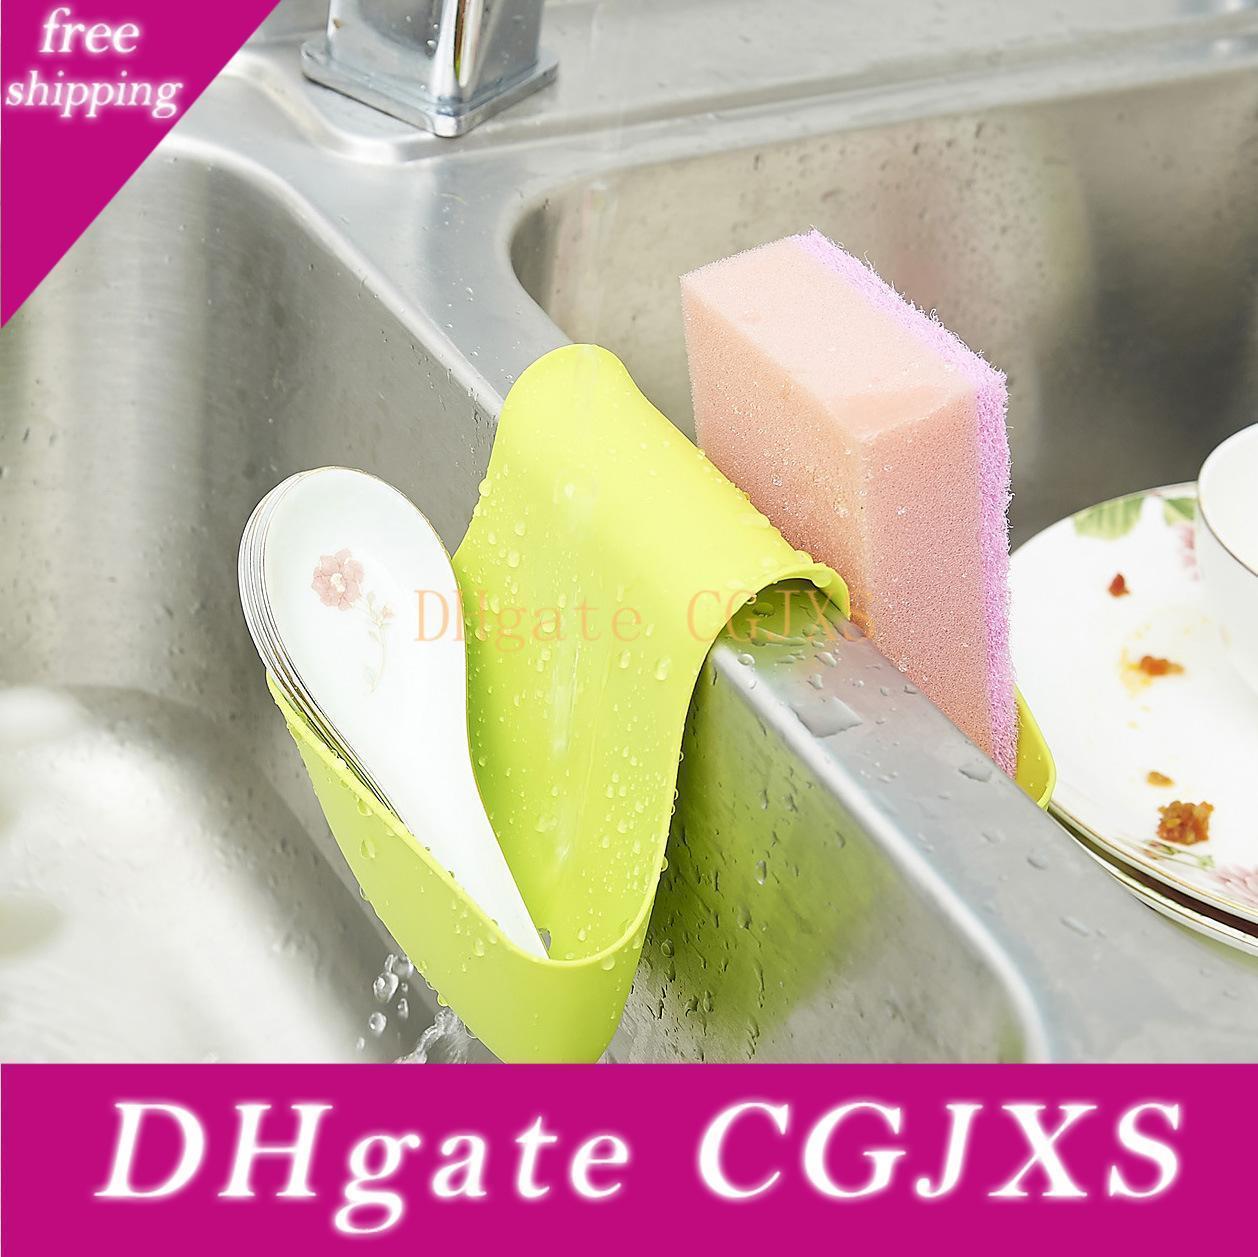 Kitchen Double Saddle Sponge Holder Sink Caddy Soap Holder Storage Sink Basket Brush Organizer Pink /Blue /Green